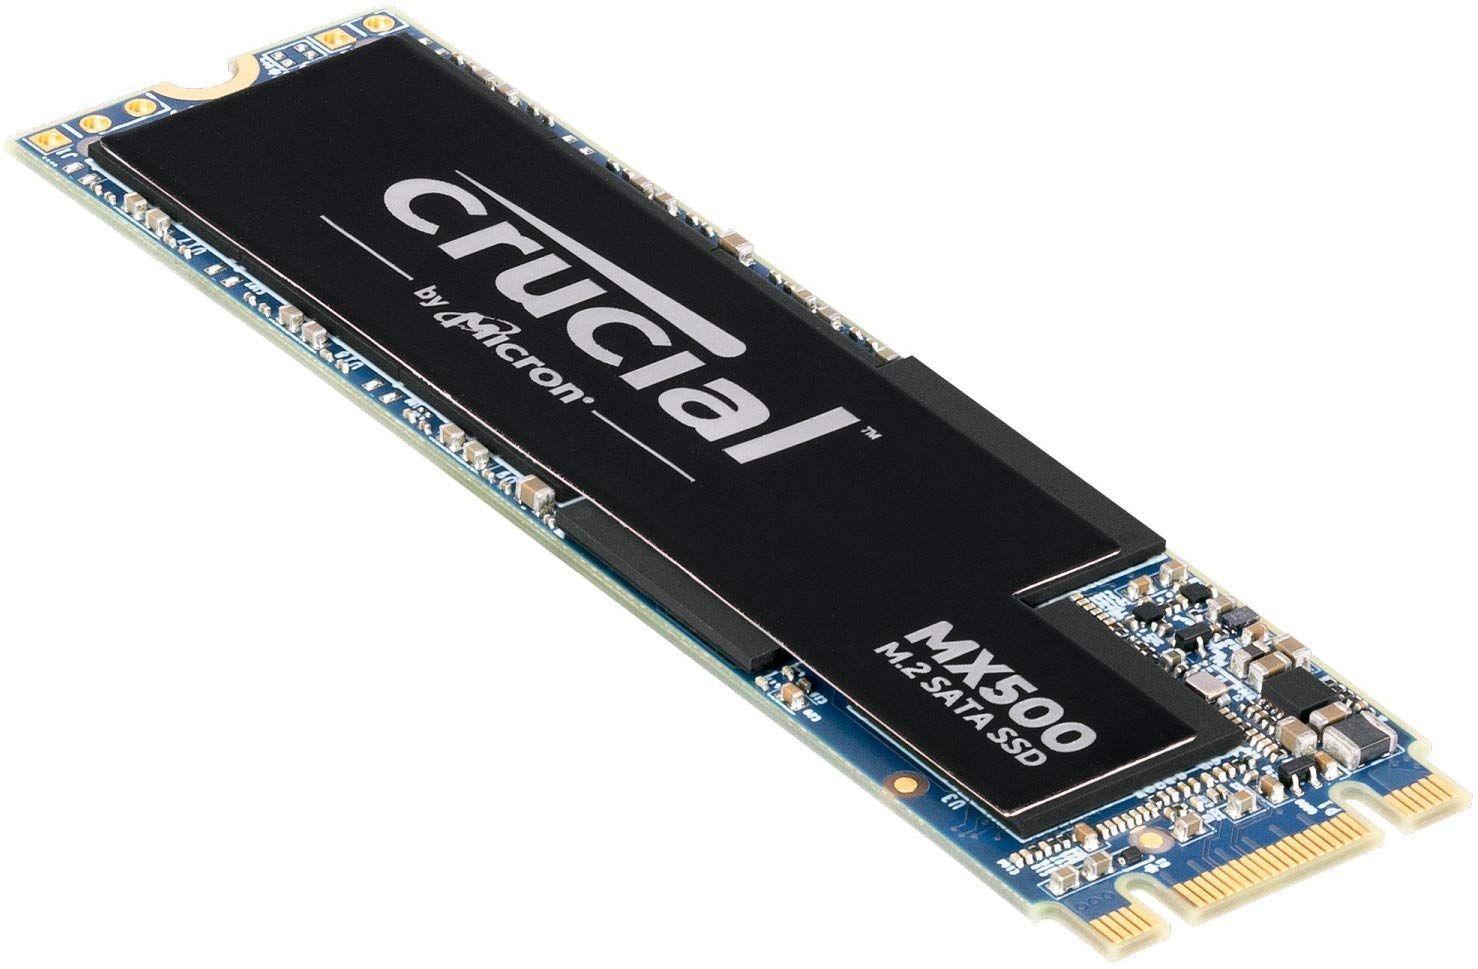 Crucial 500GB MX500 M.2 SATA SSDCT500MX500SSD4 £62.99 @ Amazon.co.uk